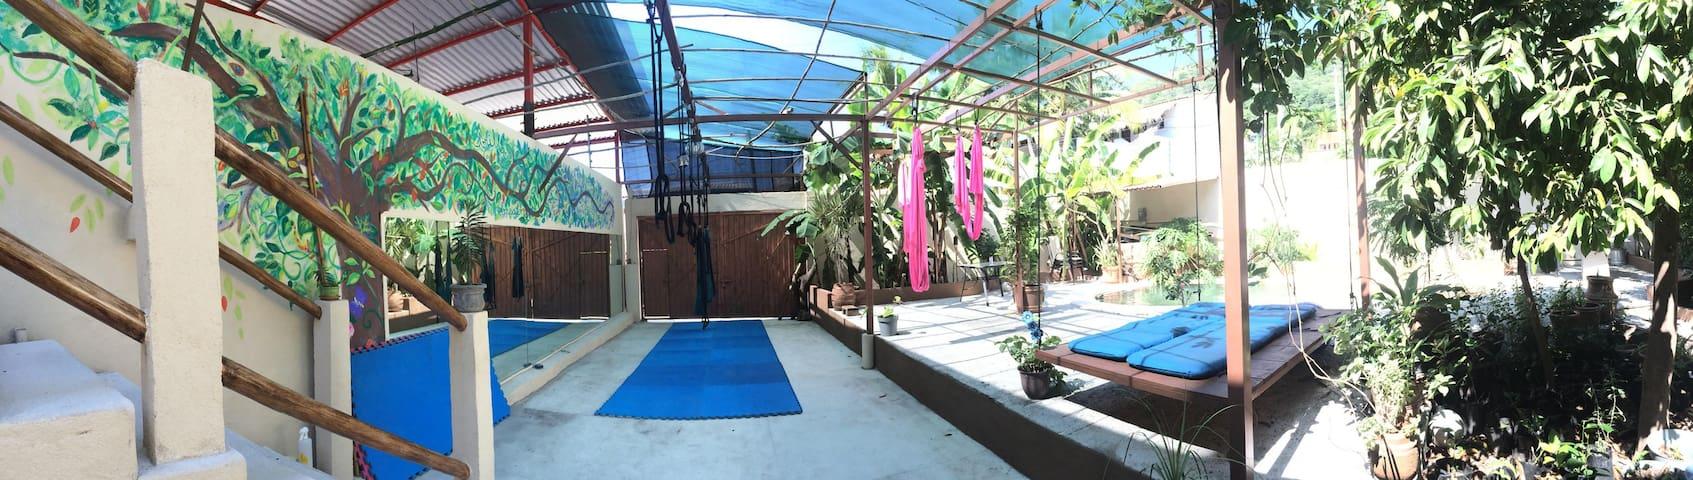 Bamboo Room - Casa De Lilly - Zihuatanejo - House